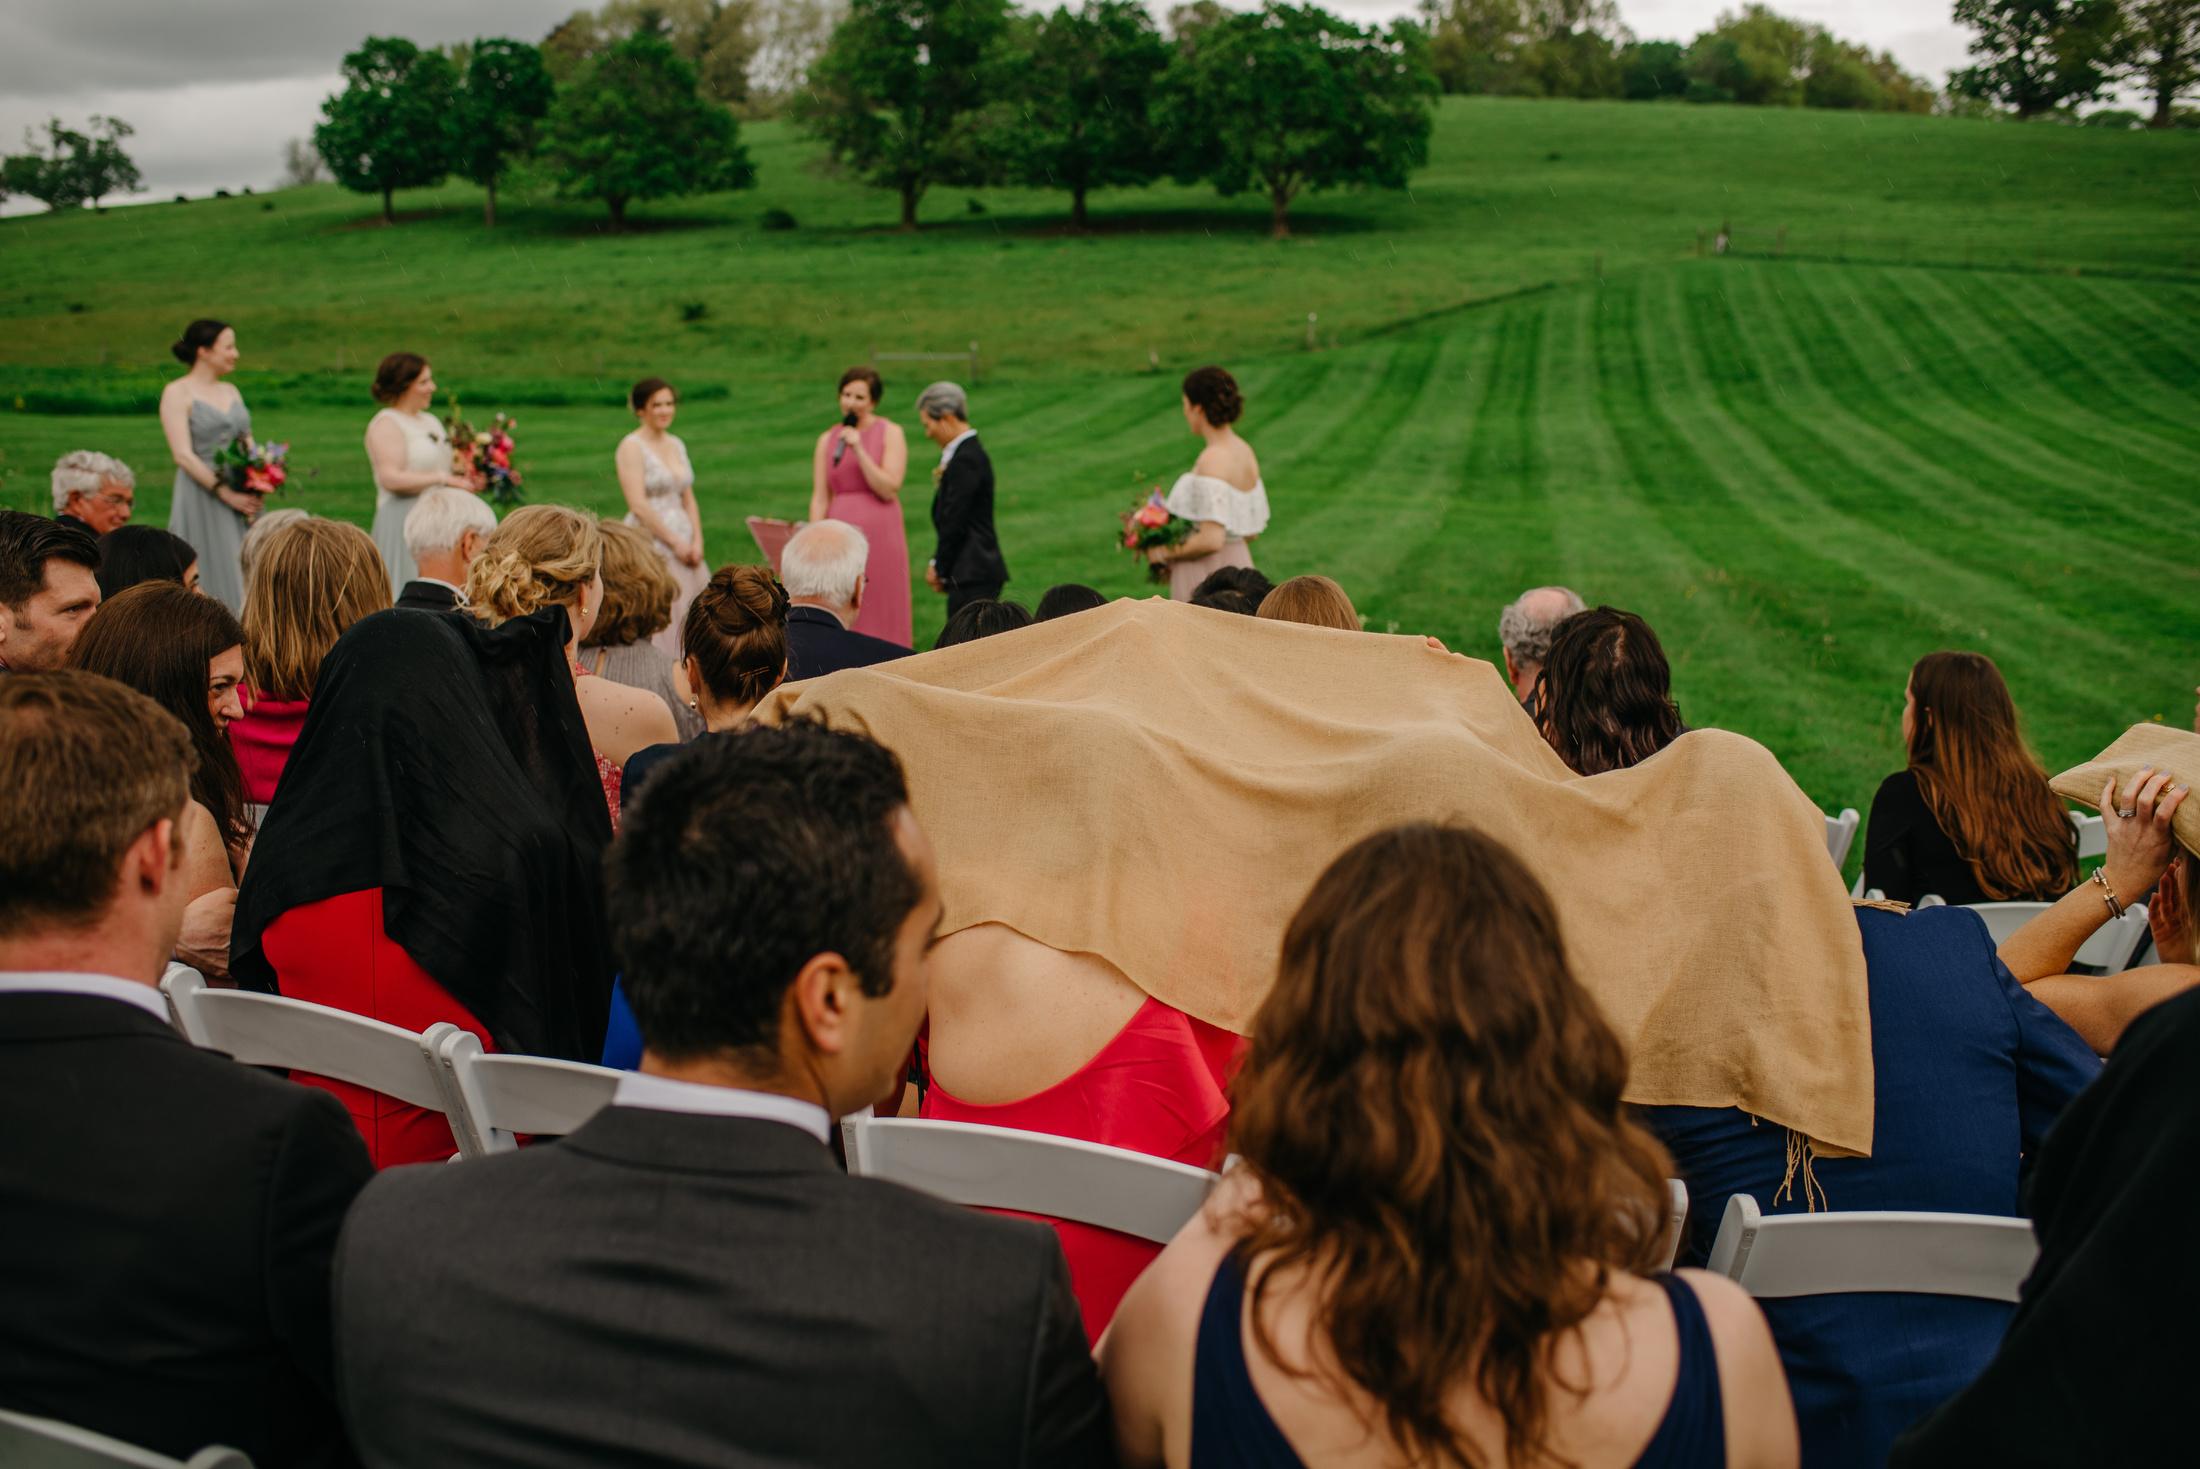 gibbet_hill_barn_same_sex_wedding_photos_42.JPG